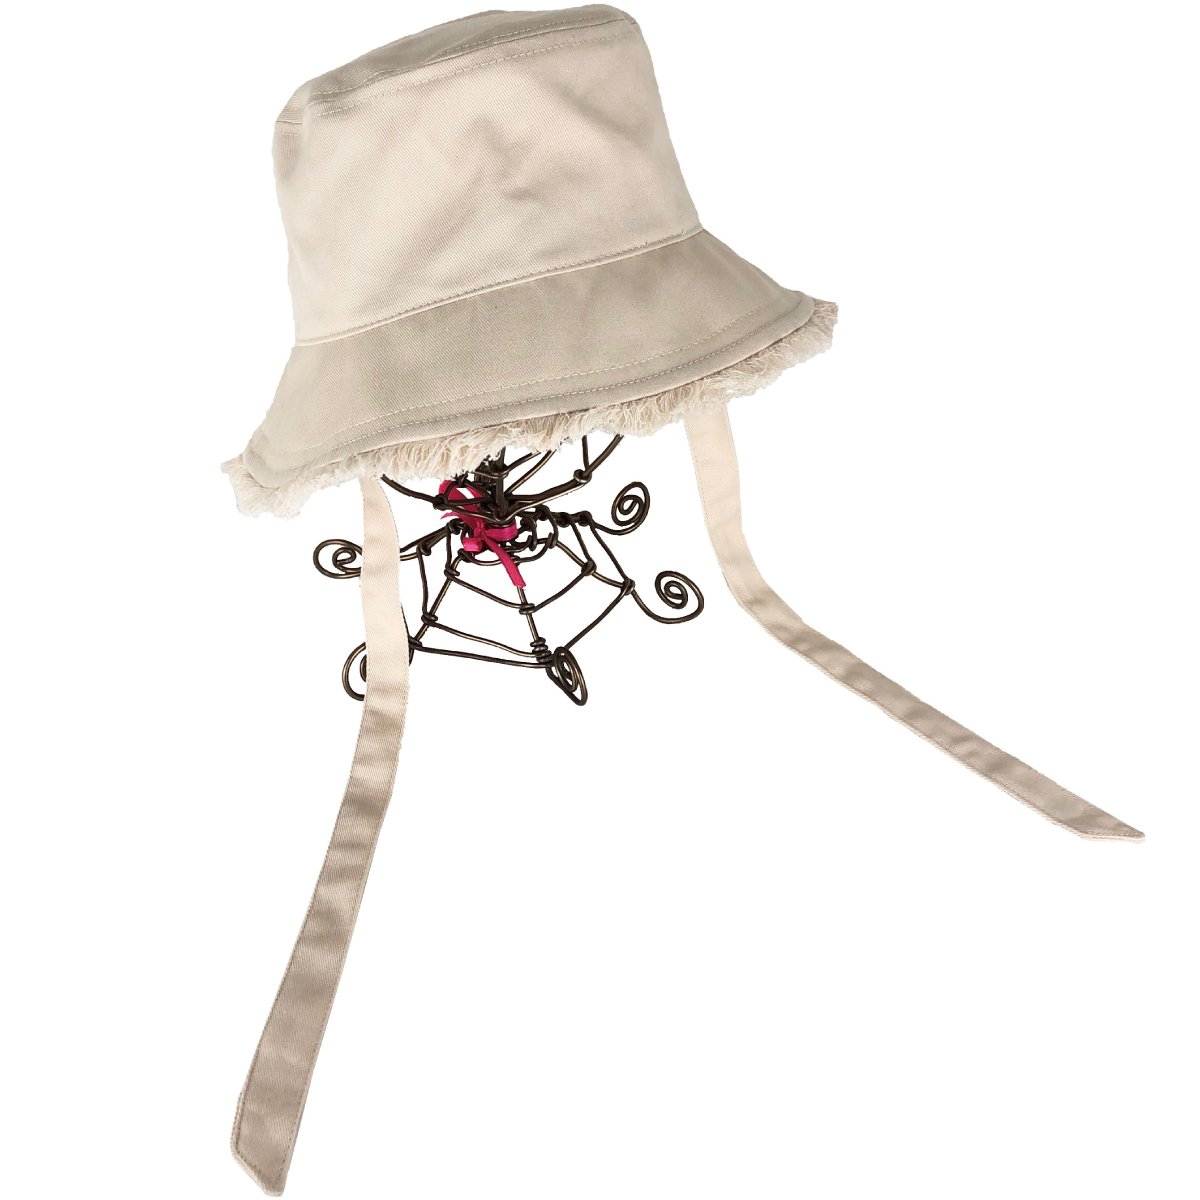 【KIDS】Kids Fringe Hat 詳細画像6